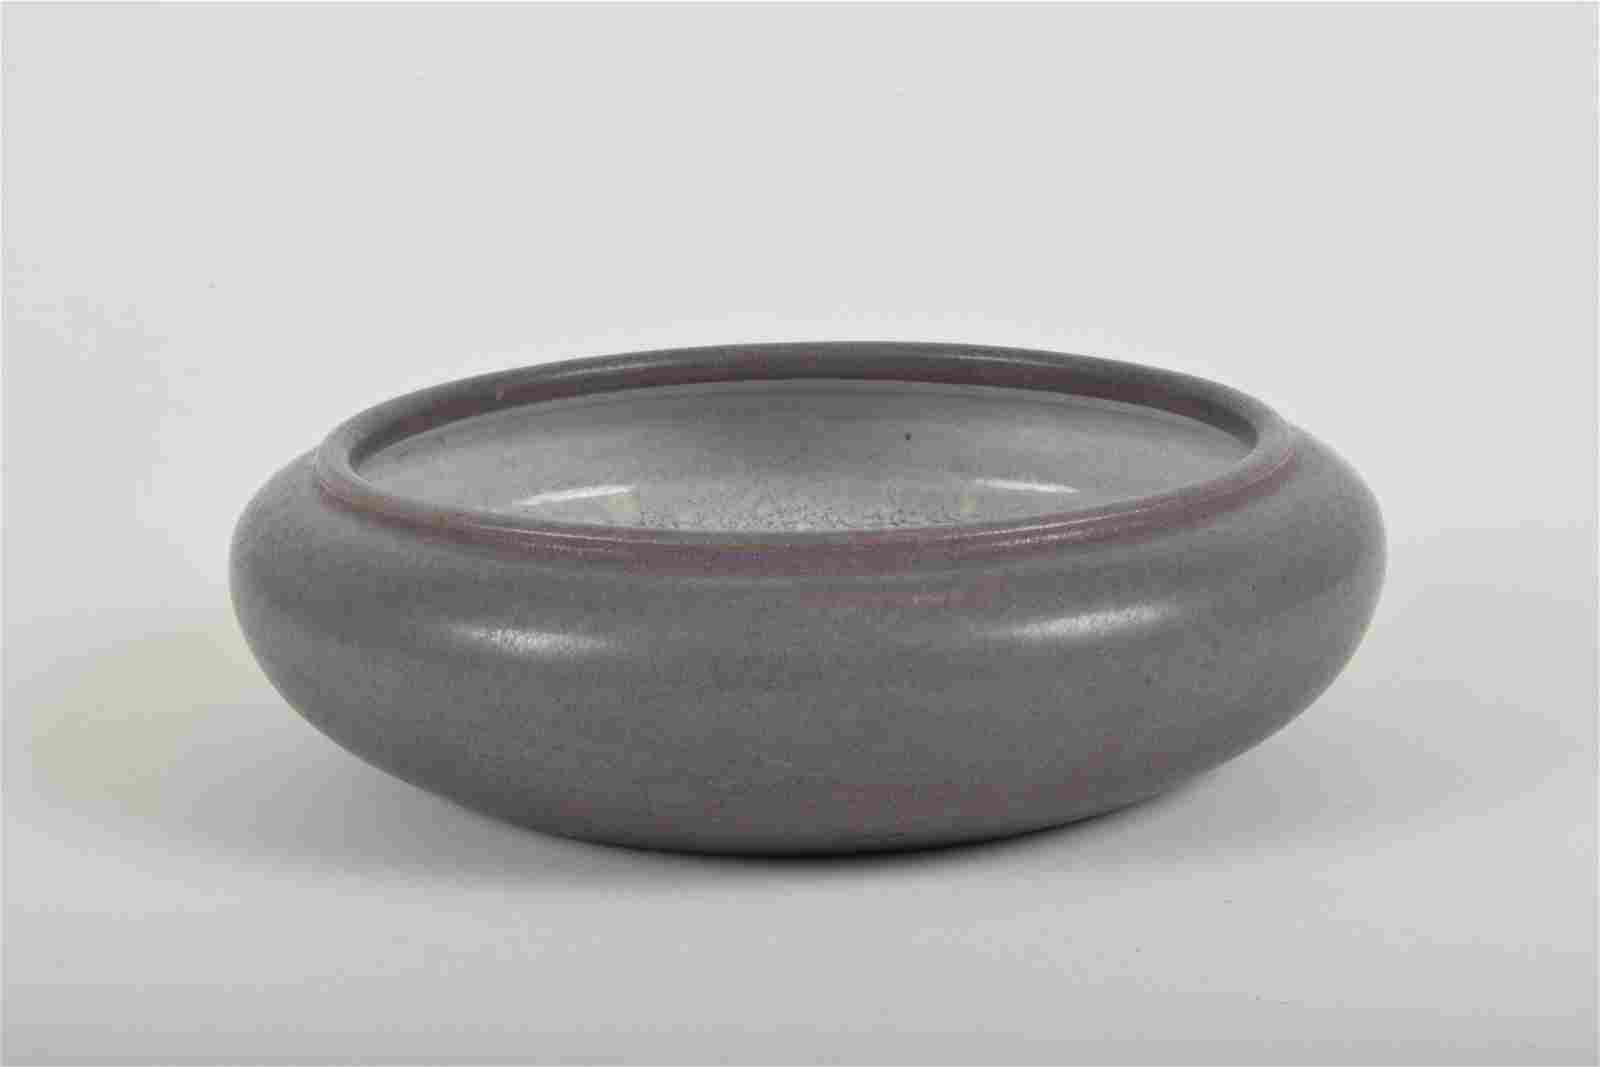 Marblehead Pottery Dish